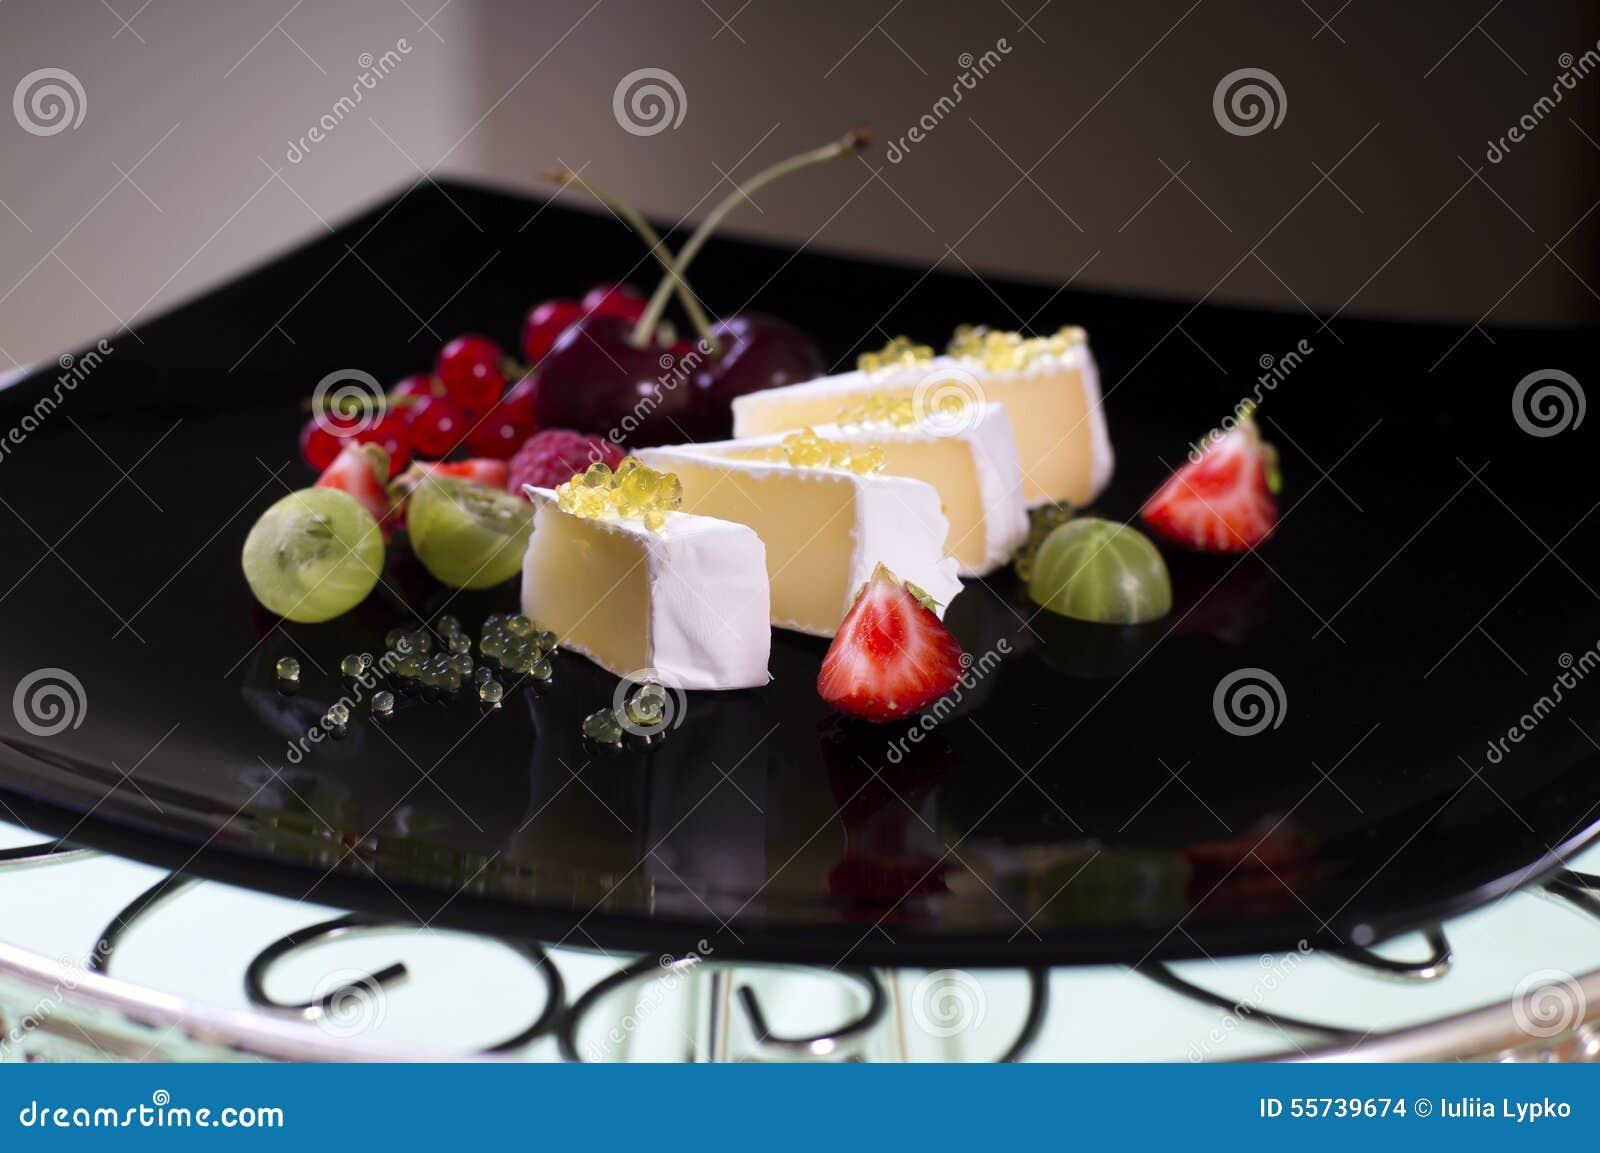 Камамбер с икрой меда и свежими ягодами